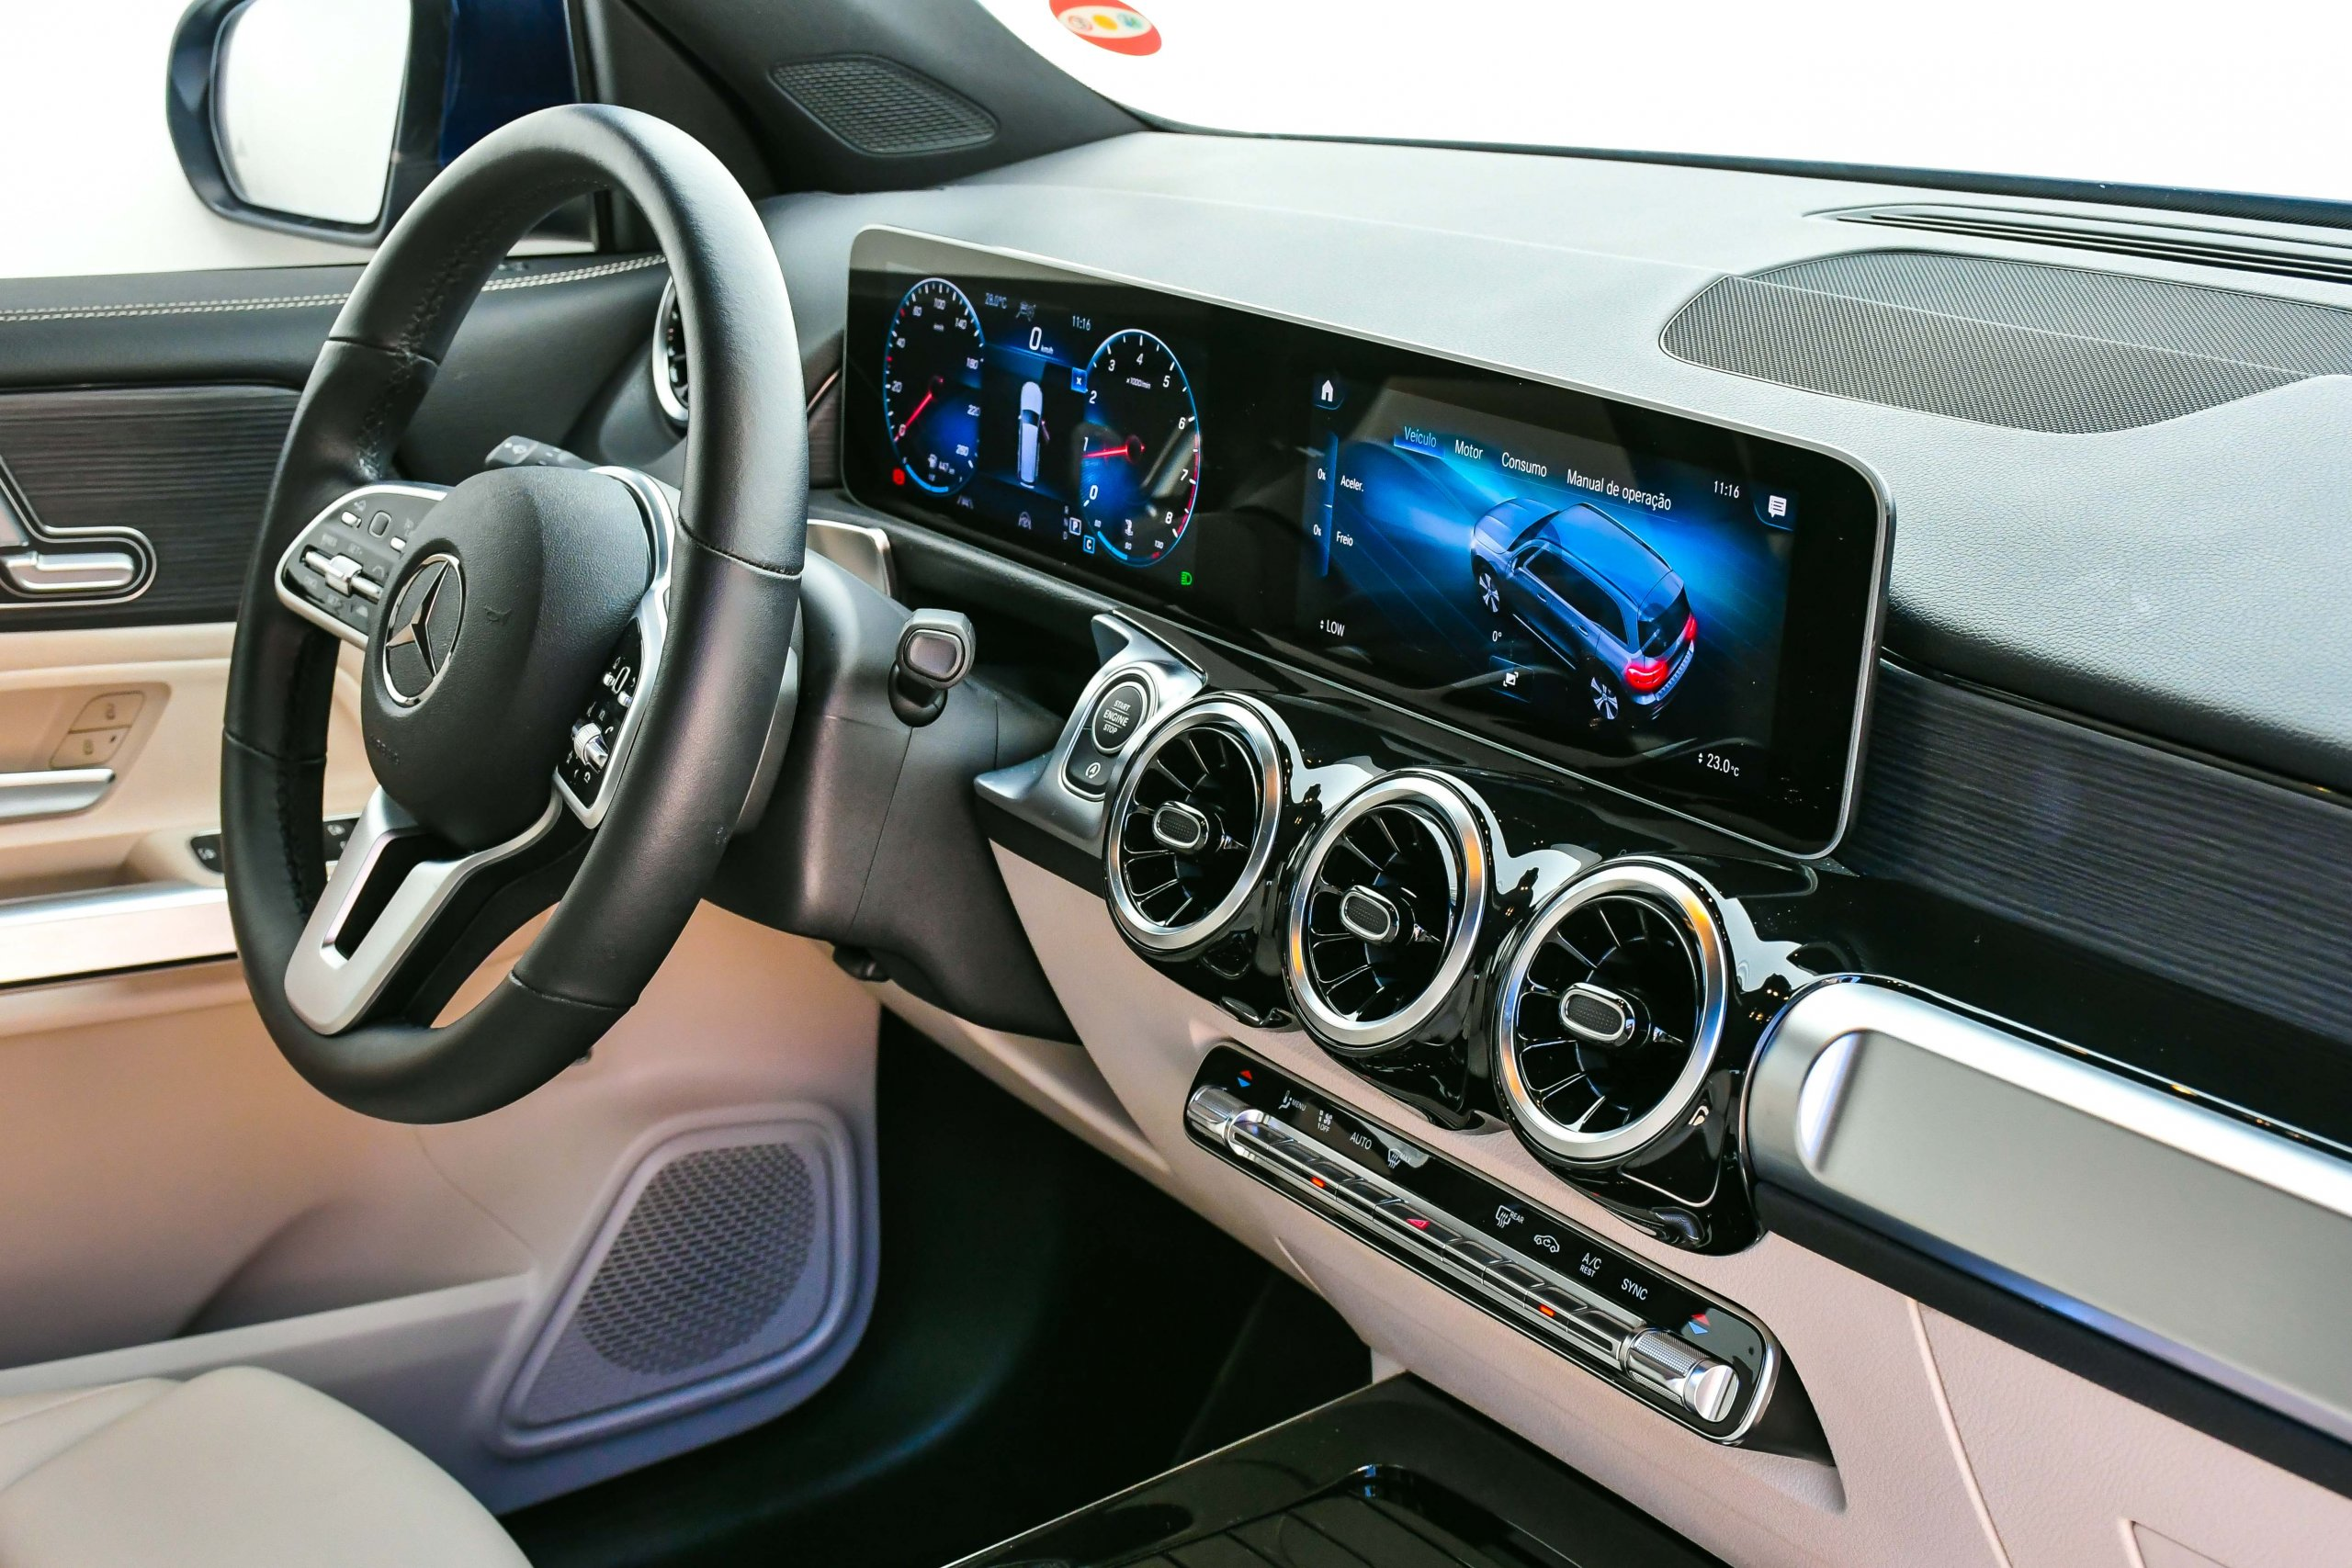 Mercedes Benz Glb 200 Launch Edition 0625